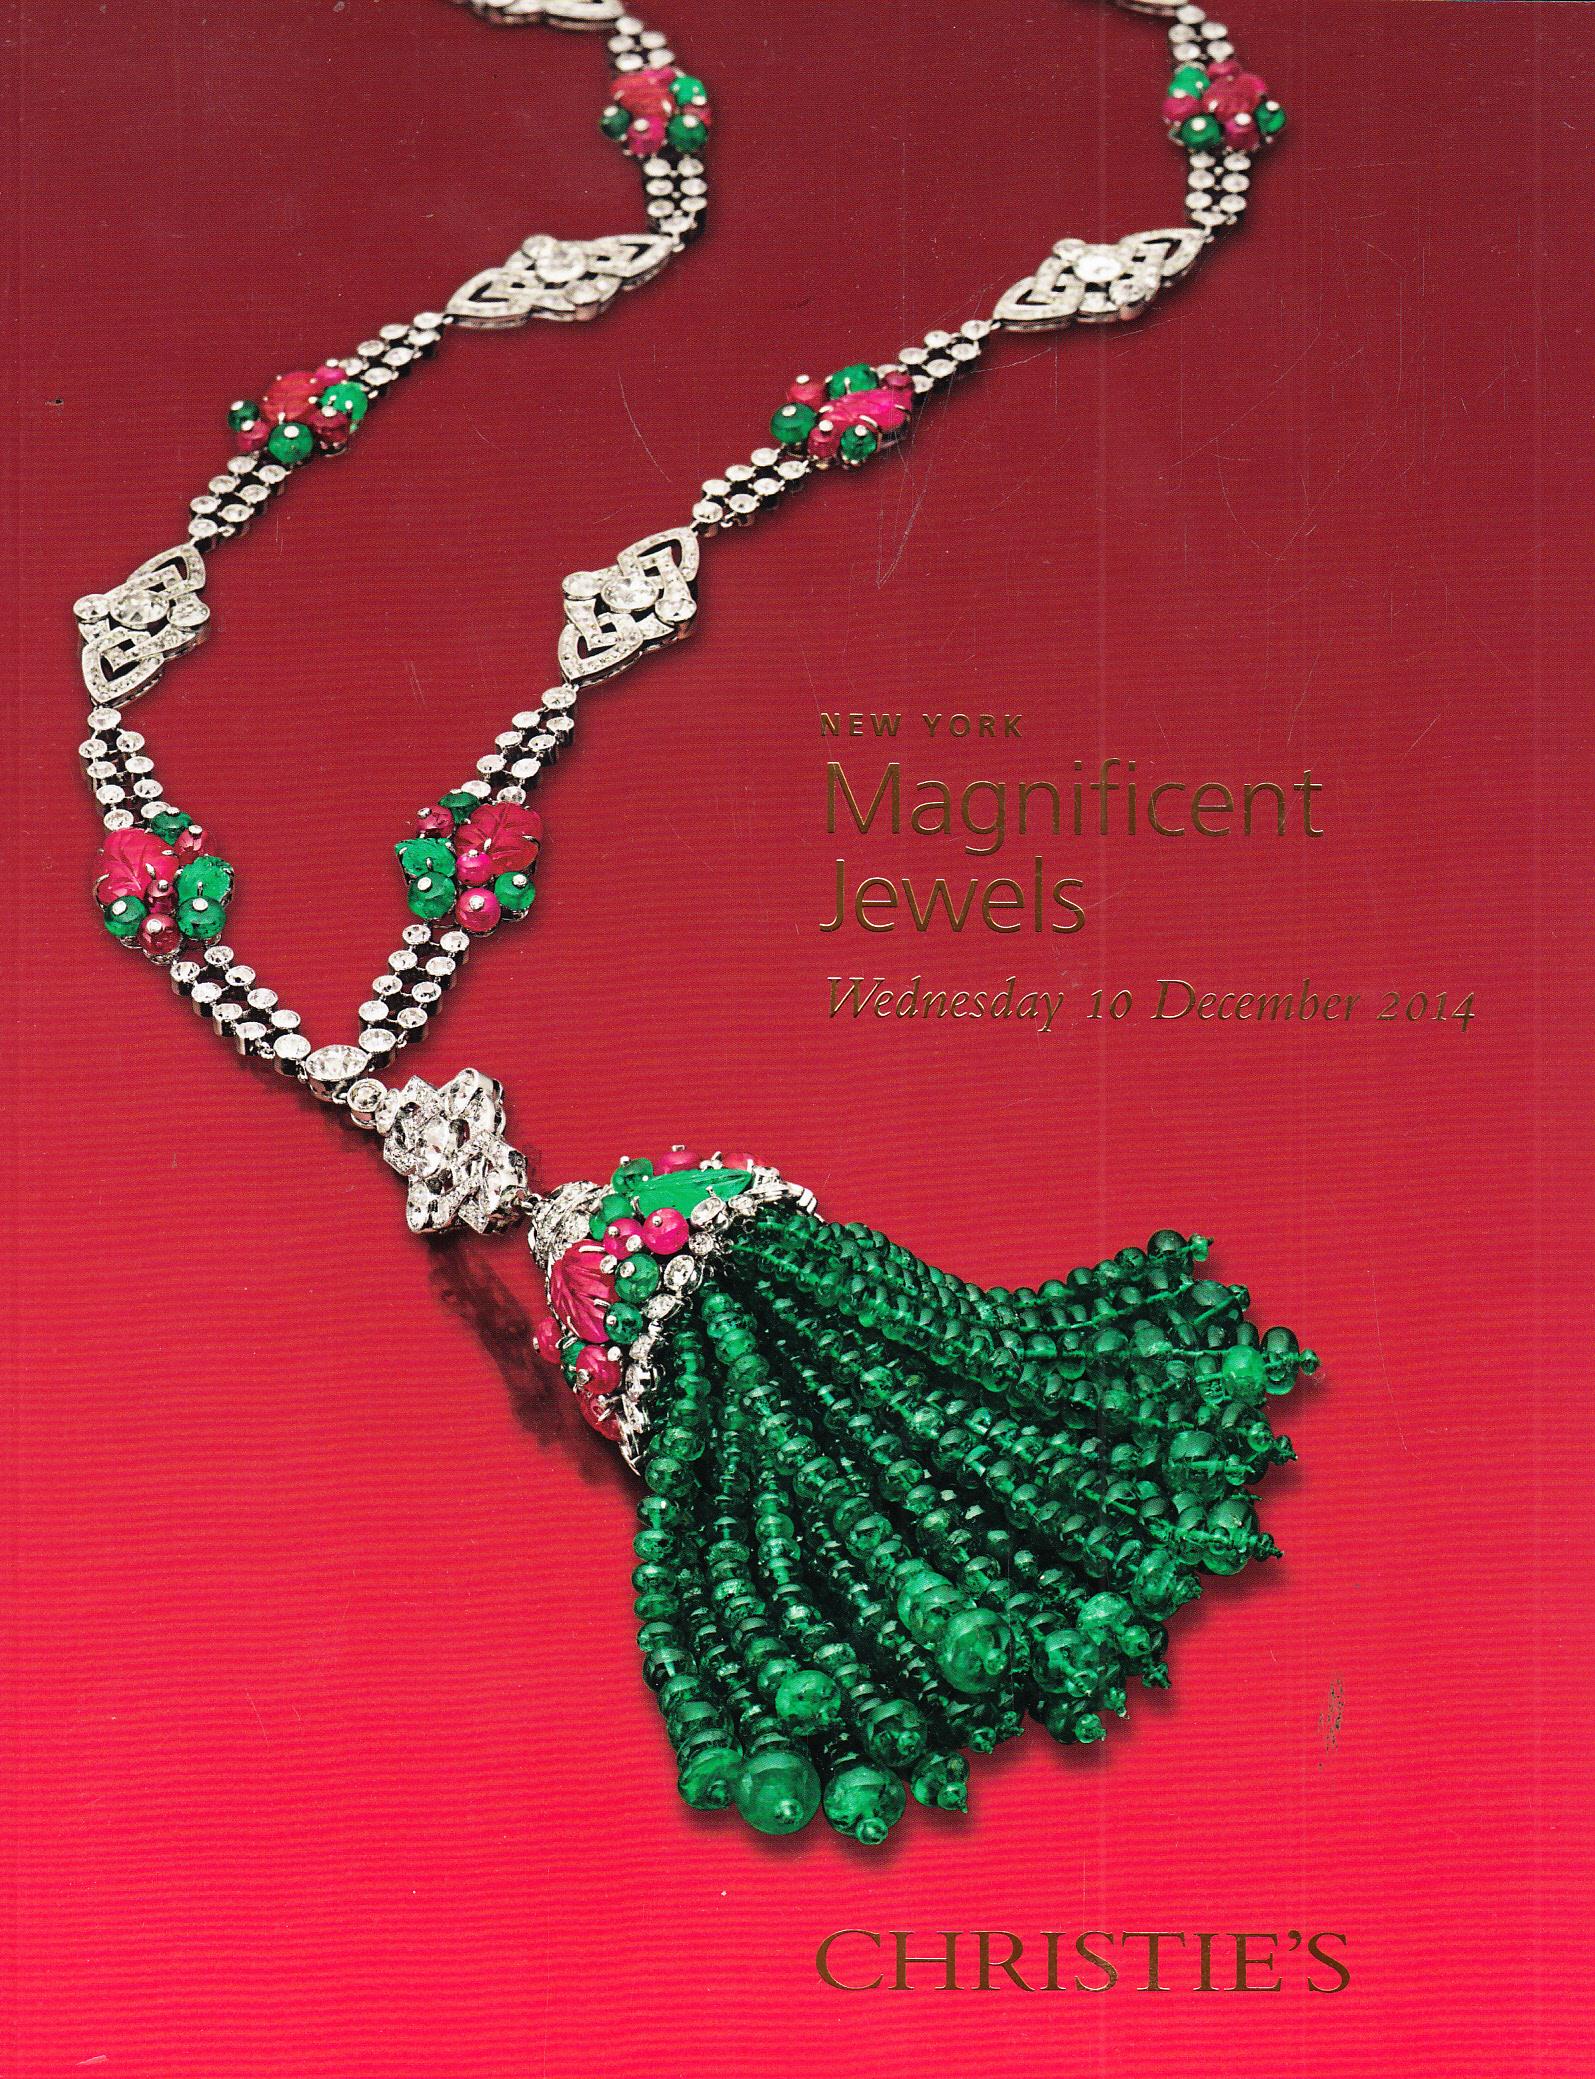 IH Christie's Magnificent Jewels New York 12/10/14 Sale ...